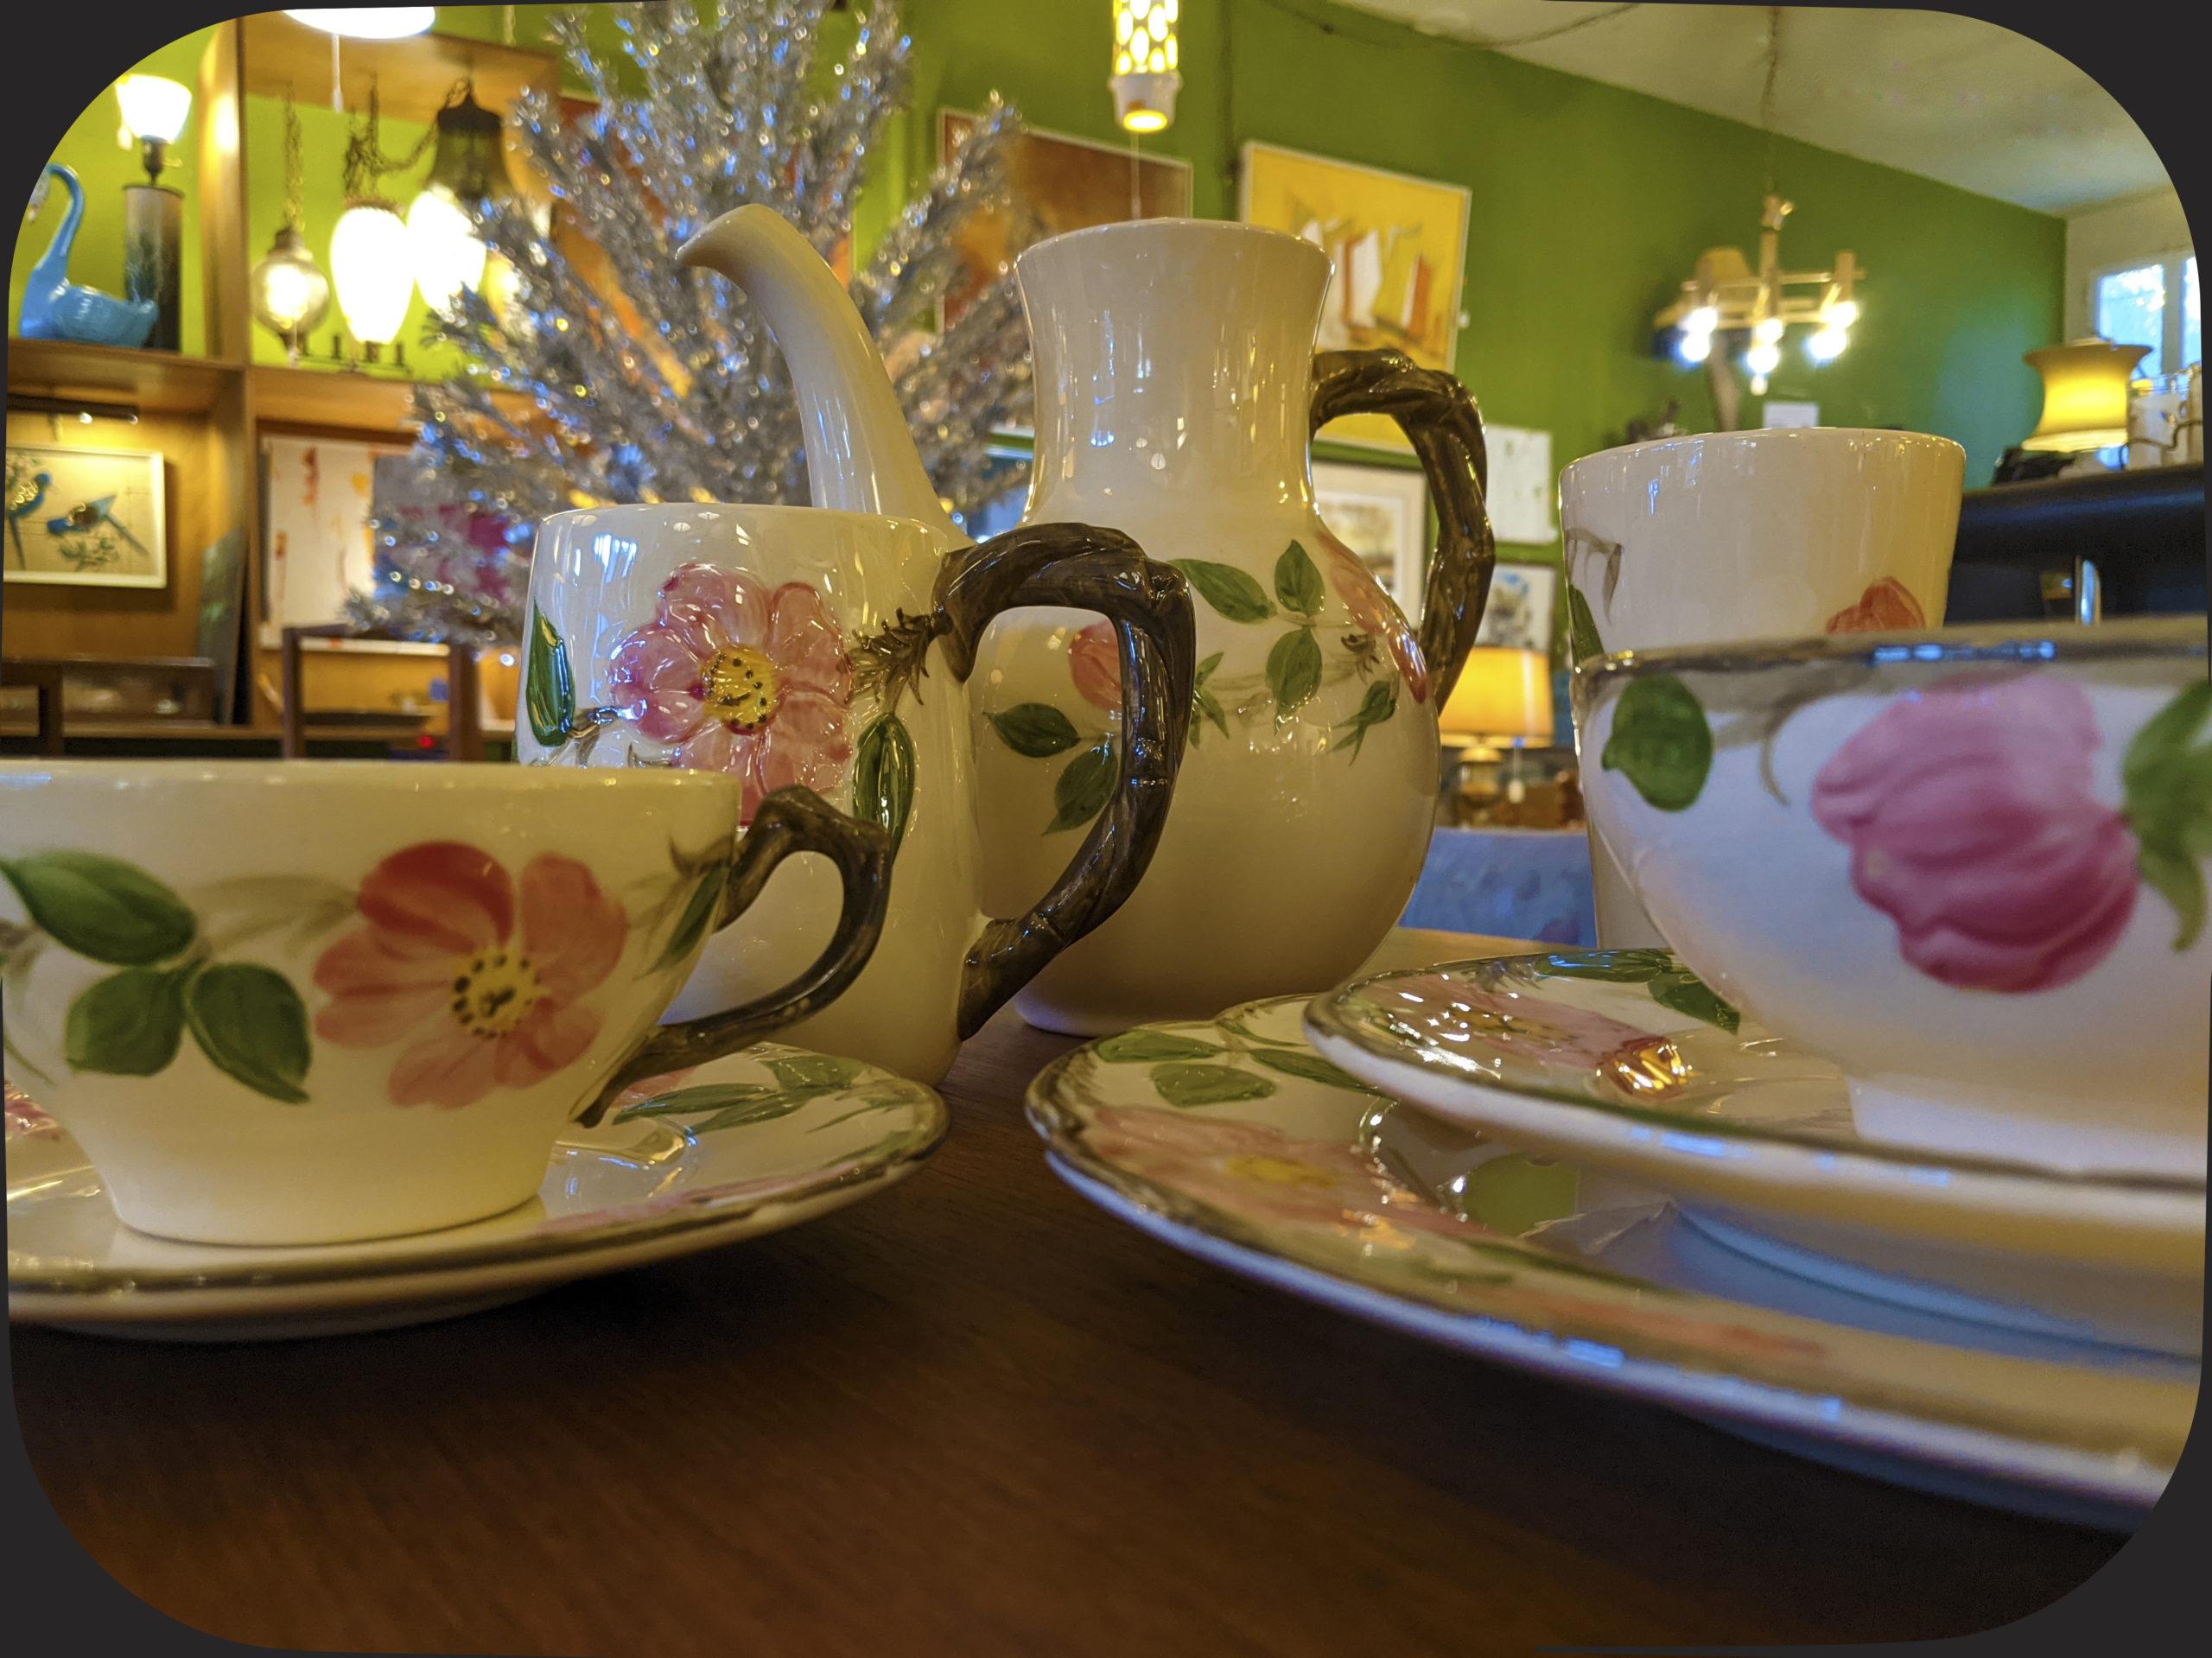 Depression era floral dinnerware